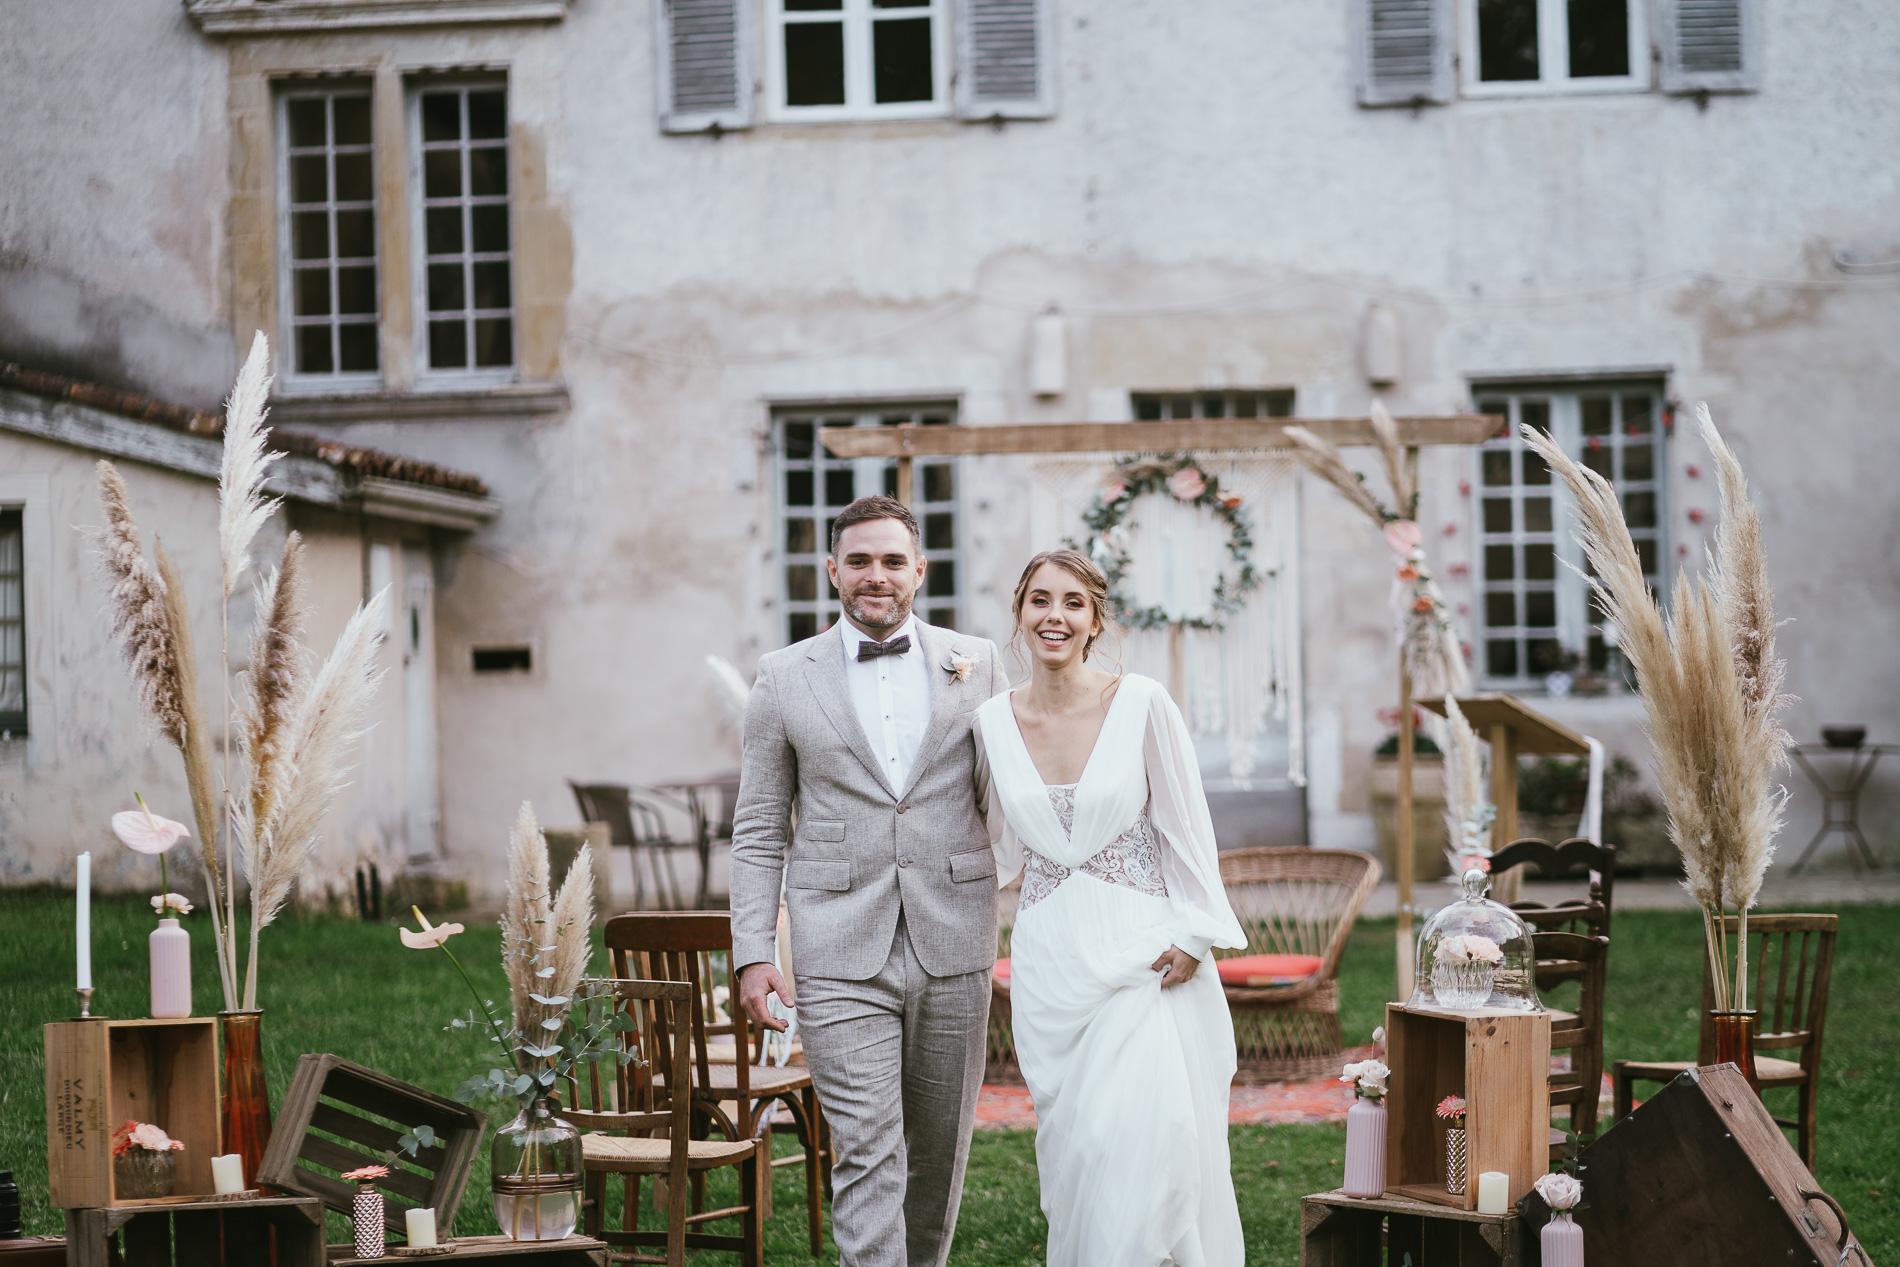 Photographe mariage landes dax aquitaine boheme moody chic 17